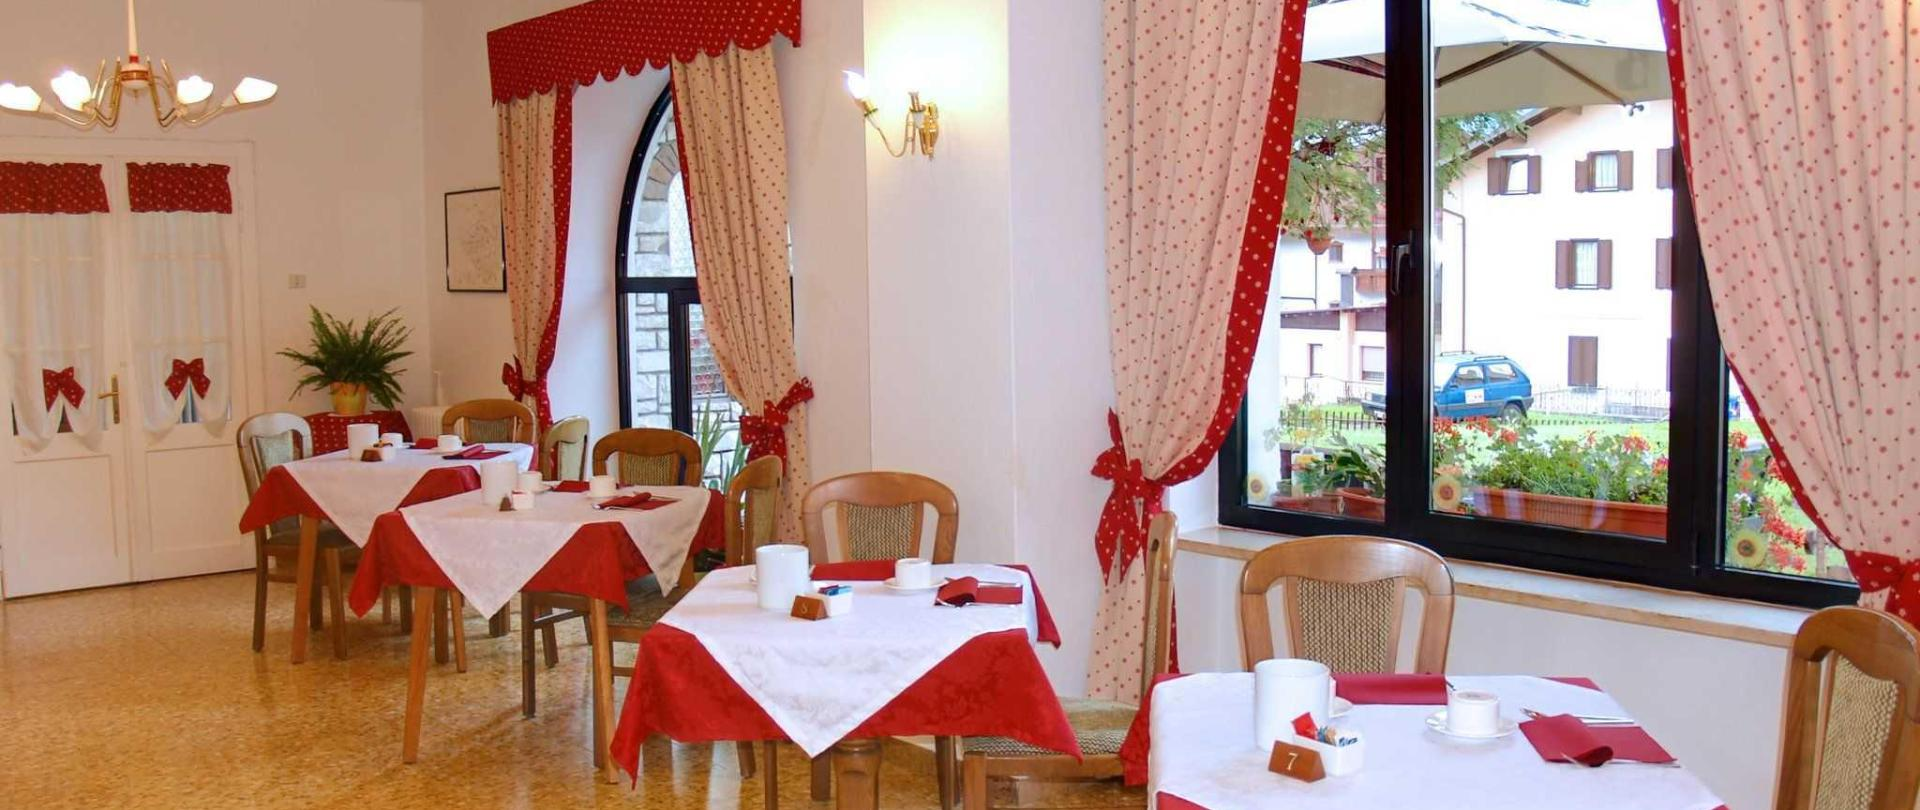 ristorante-2-1.jpg